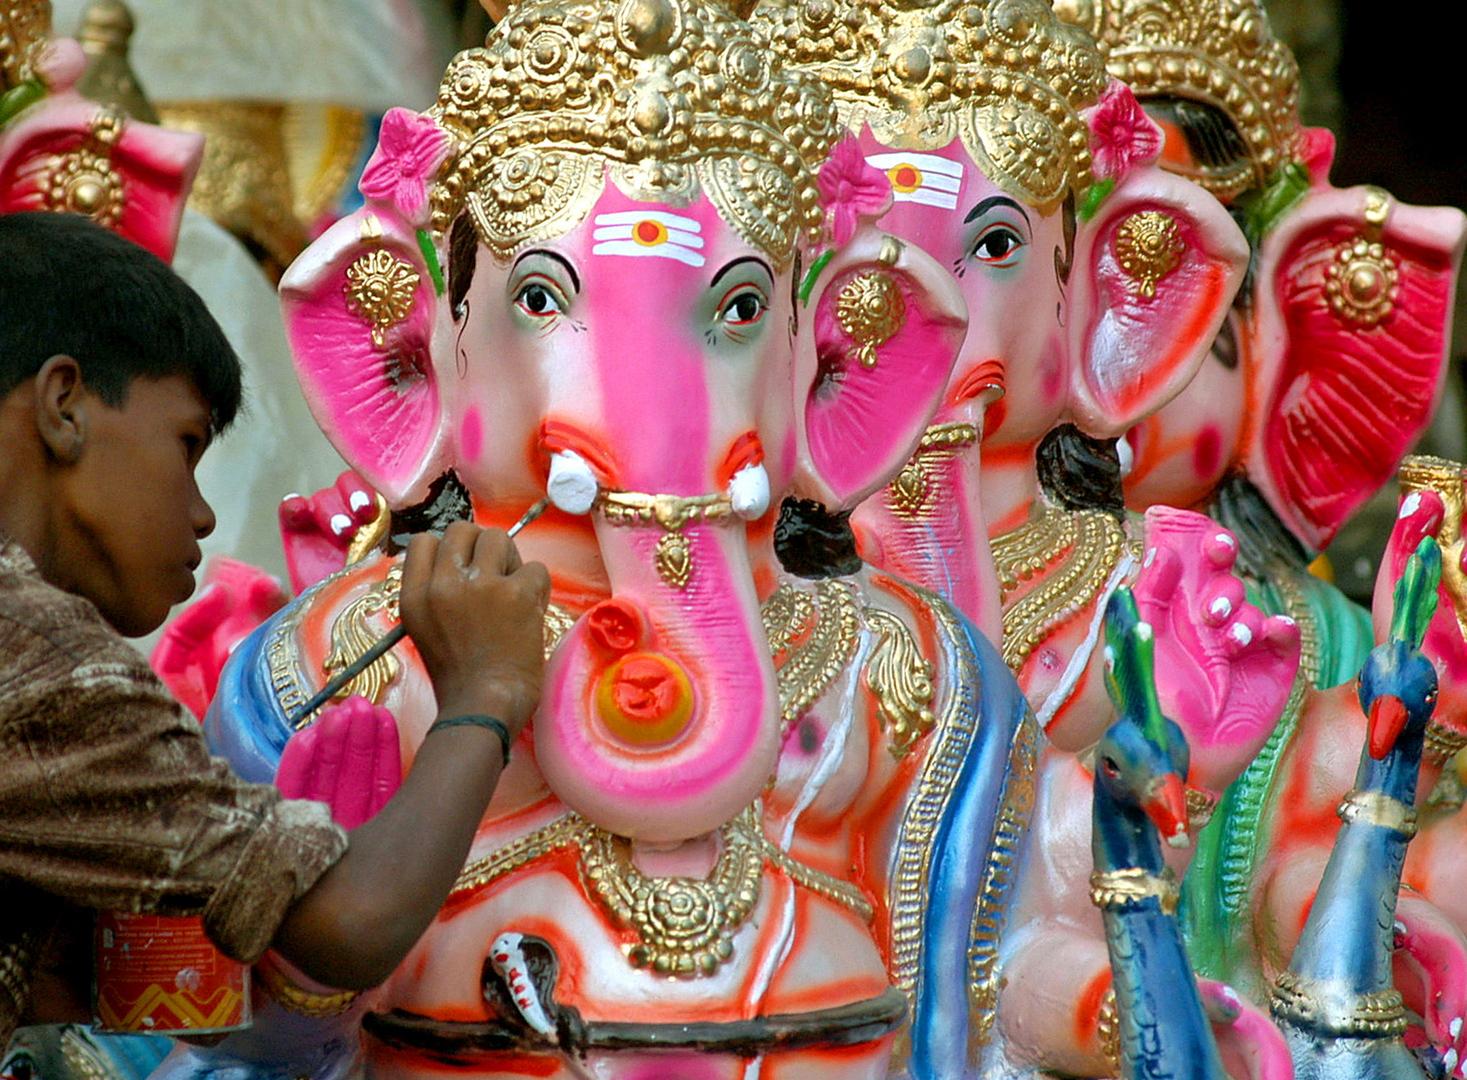 زعيم هندوسي يحتج على وضع صور